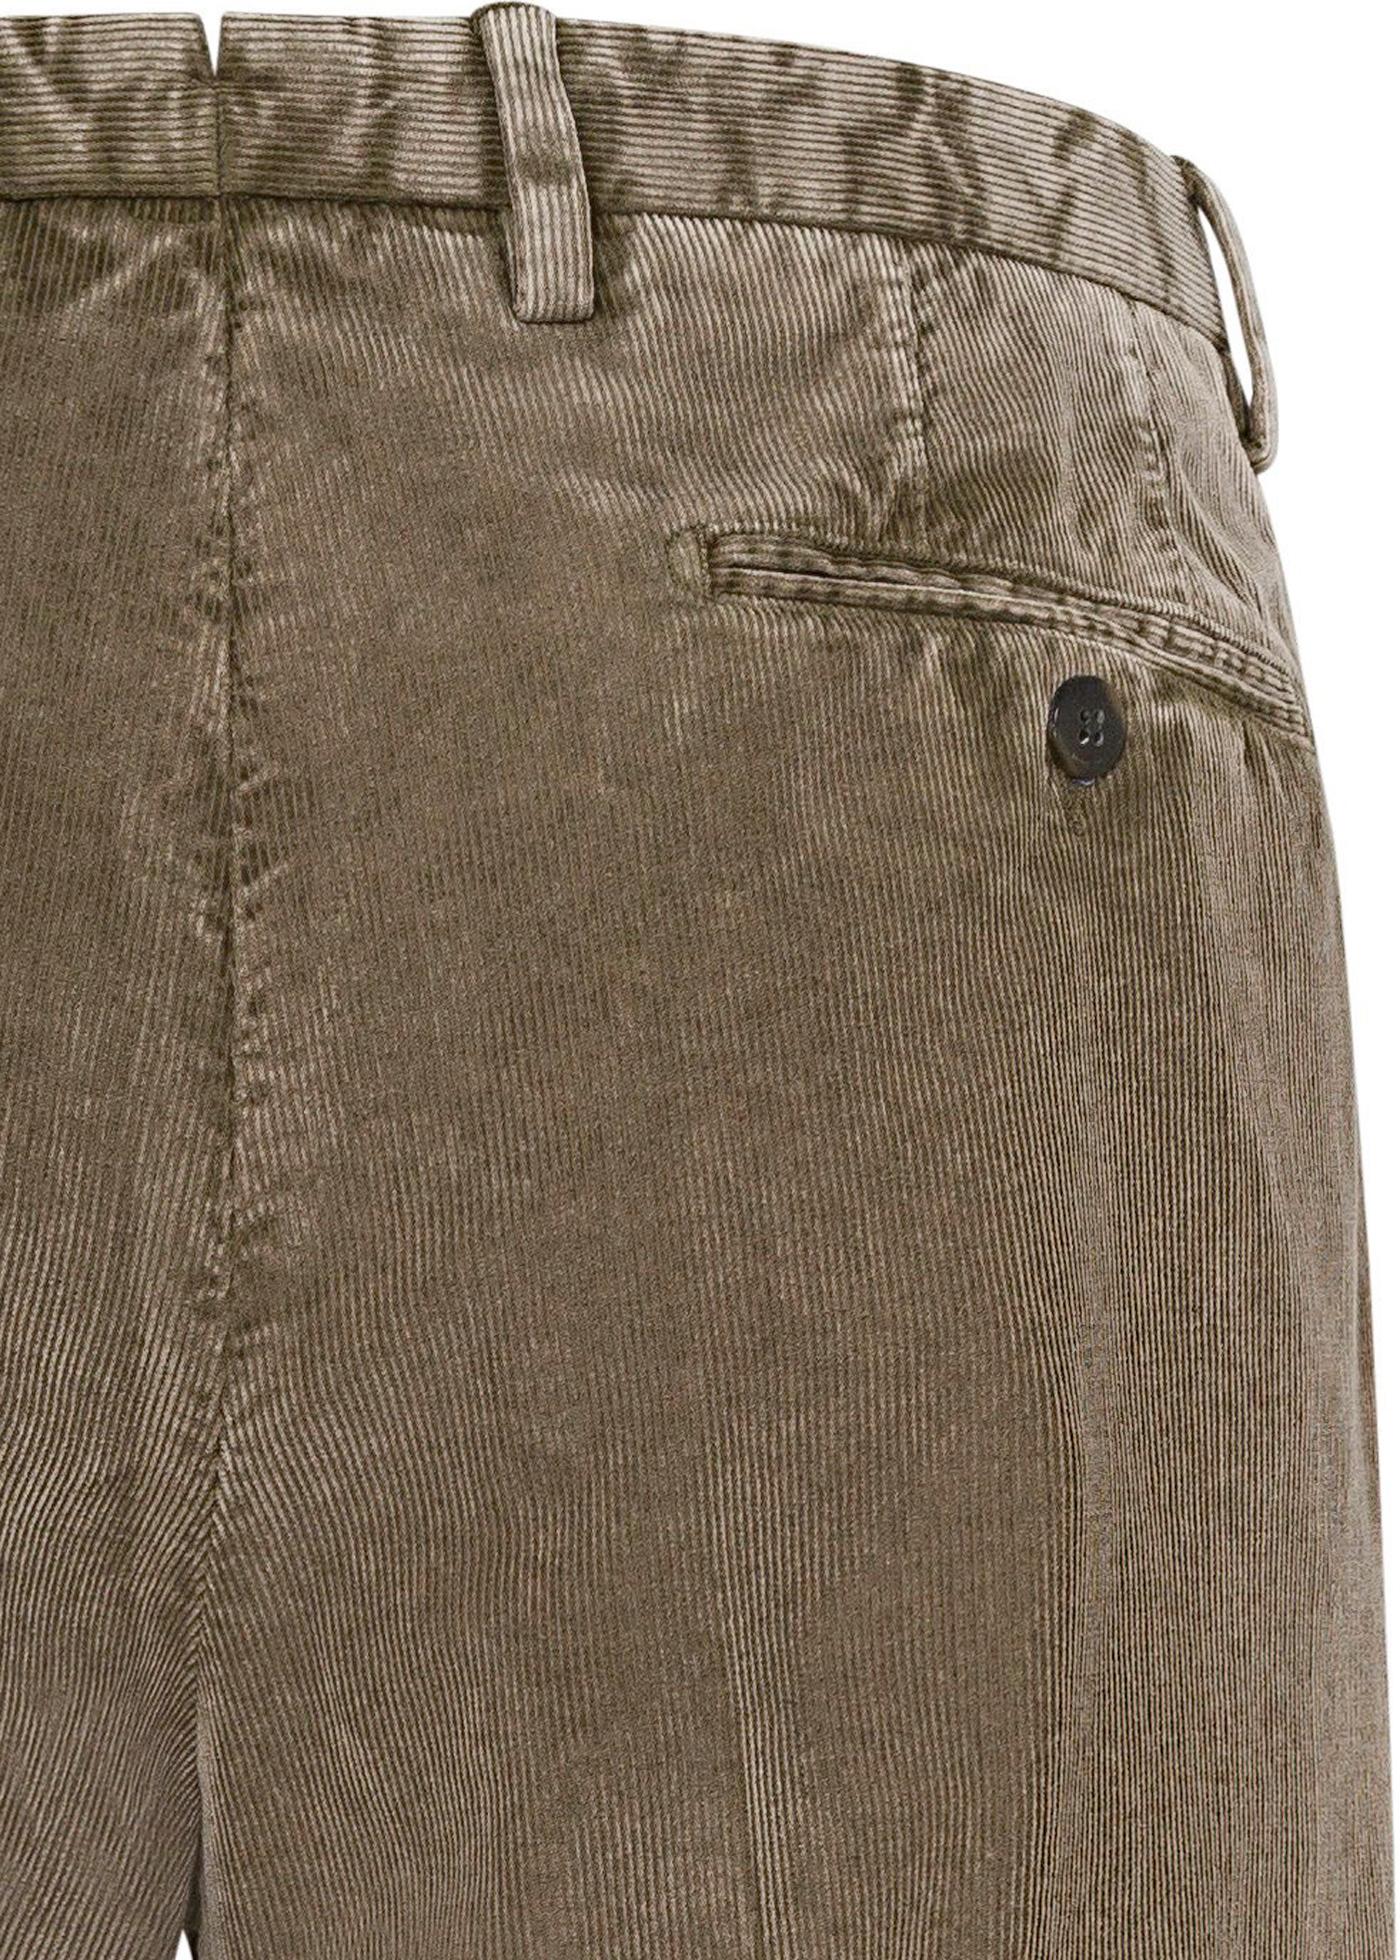 Washed Corduroy Pants image number 3